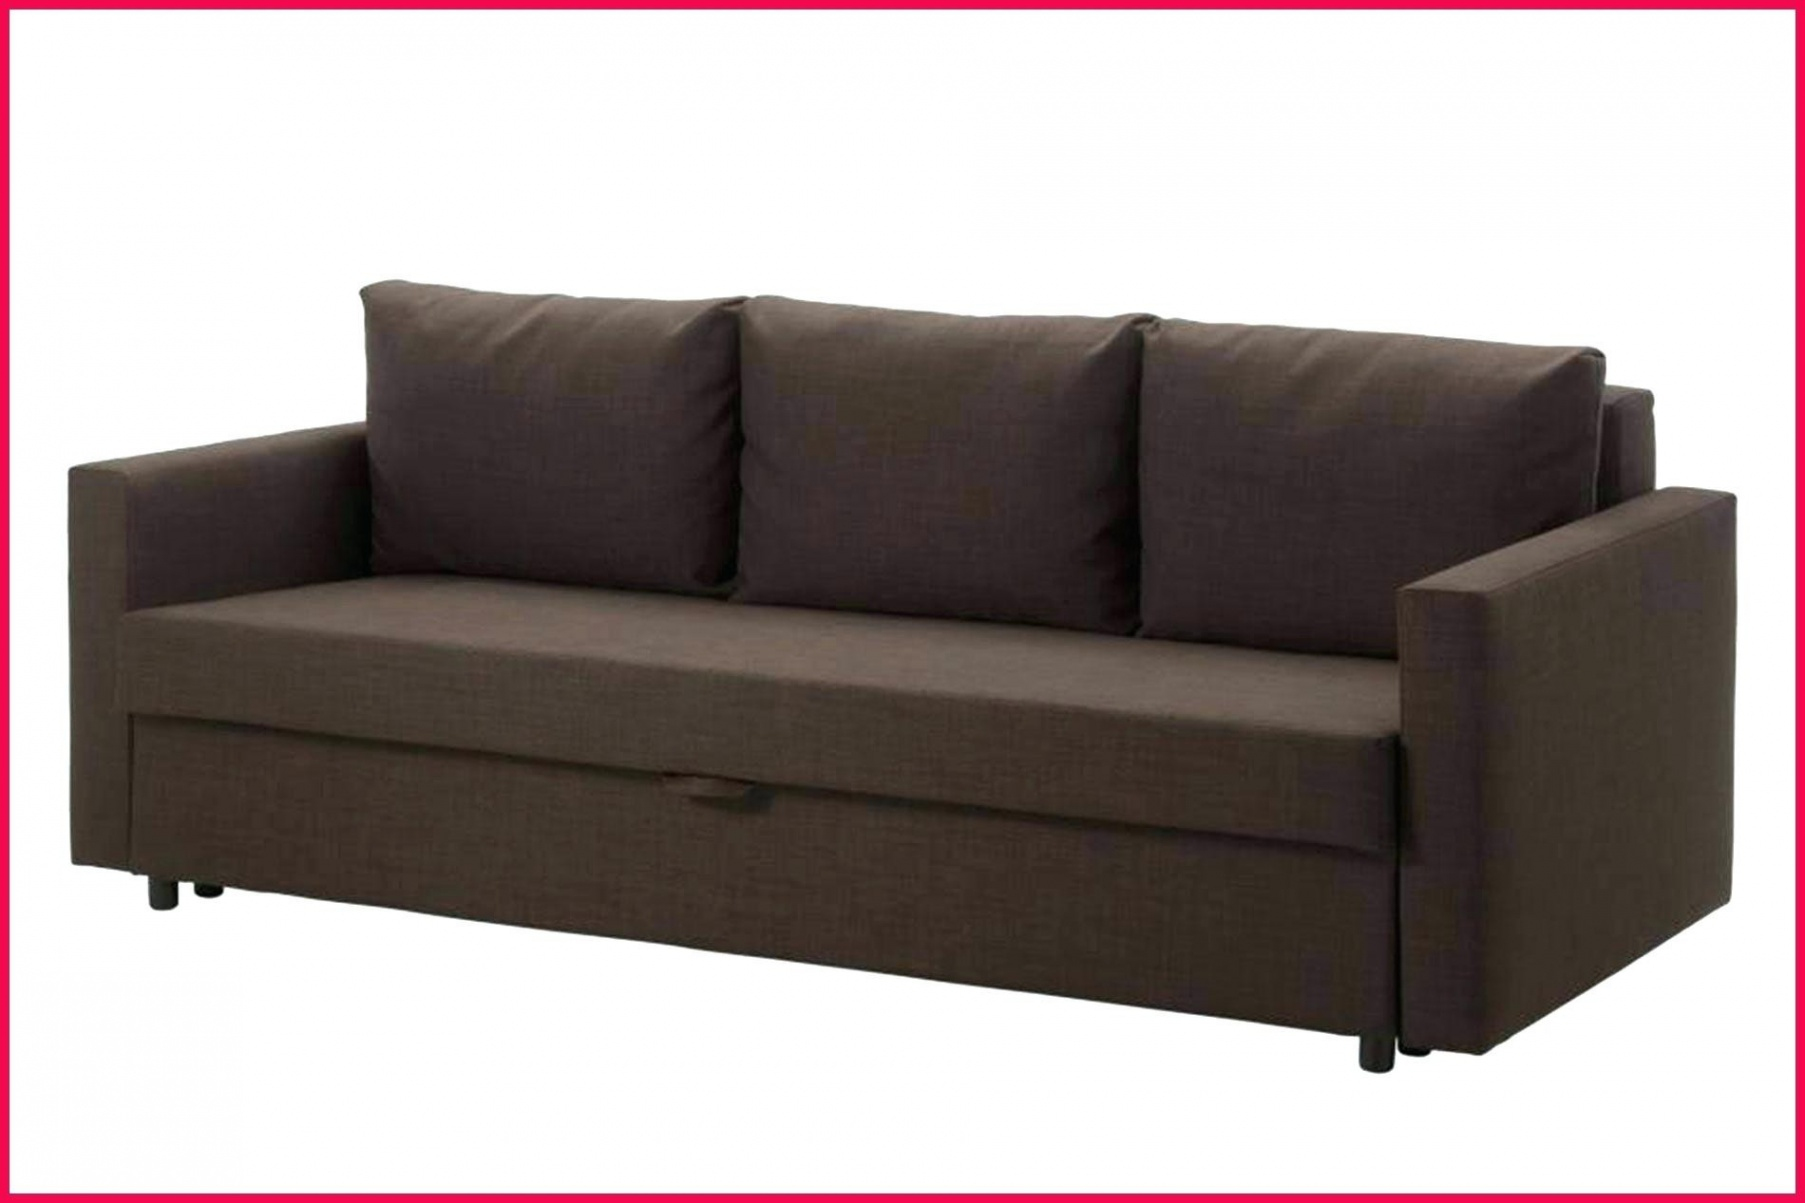 Canapé Angle Ikea Convertible Inspirant Collection Canapé 3 Places Cuir — Laguerredesmots